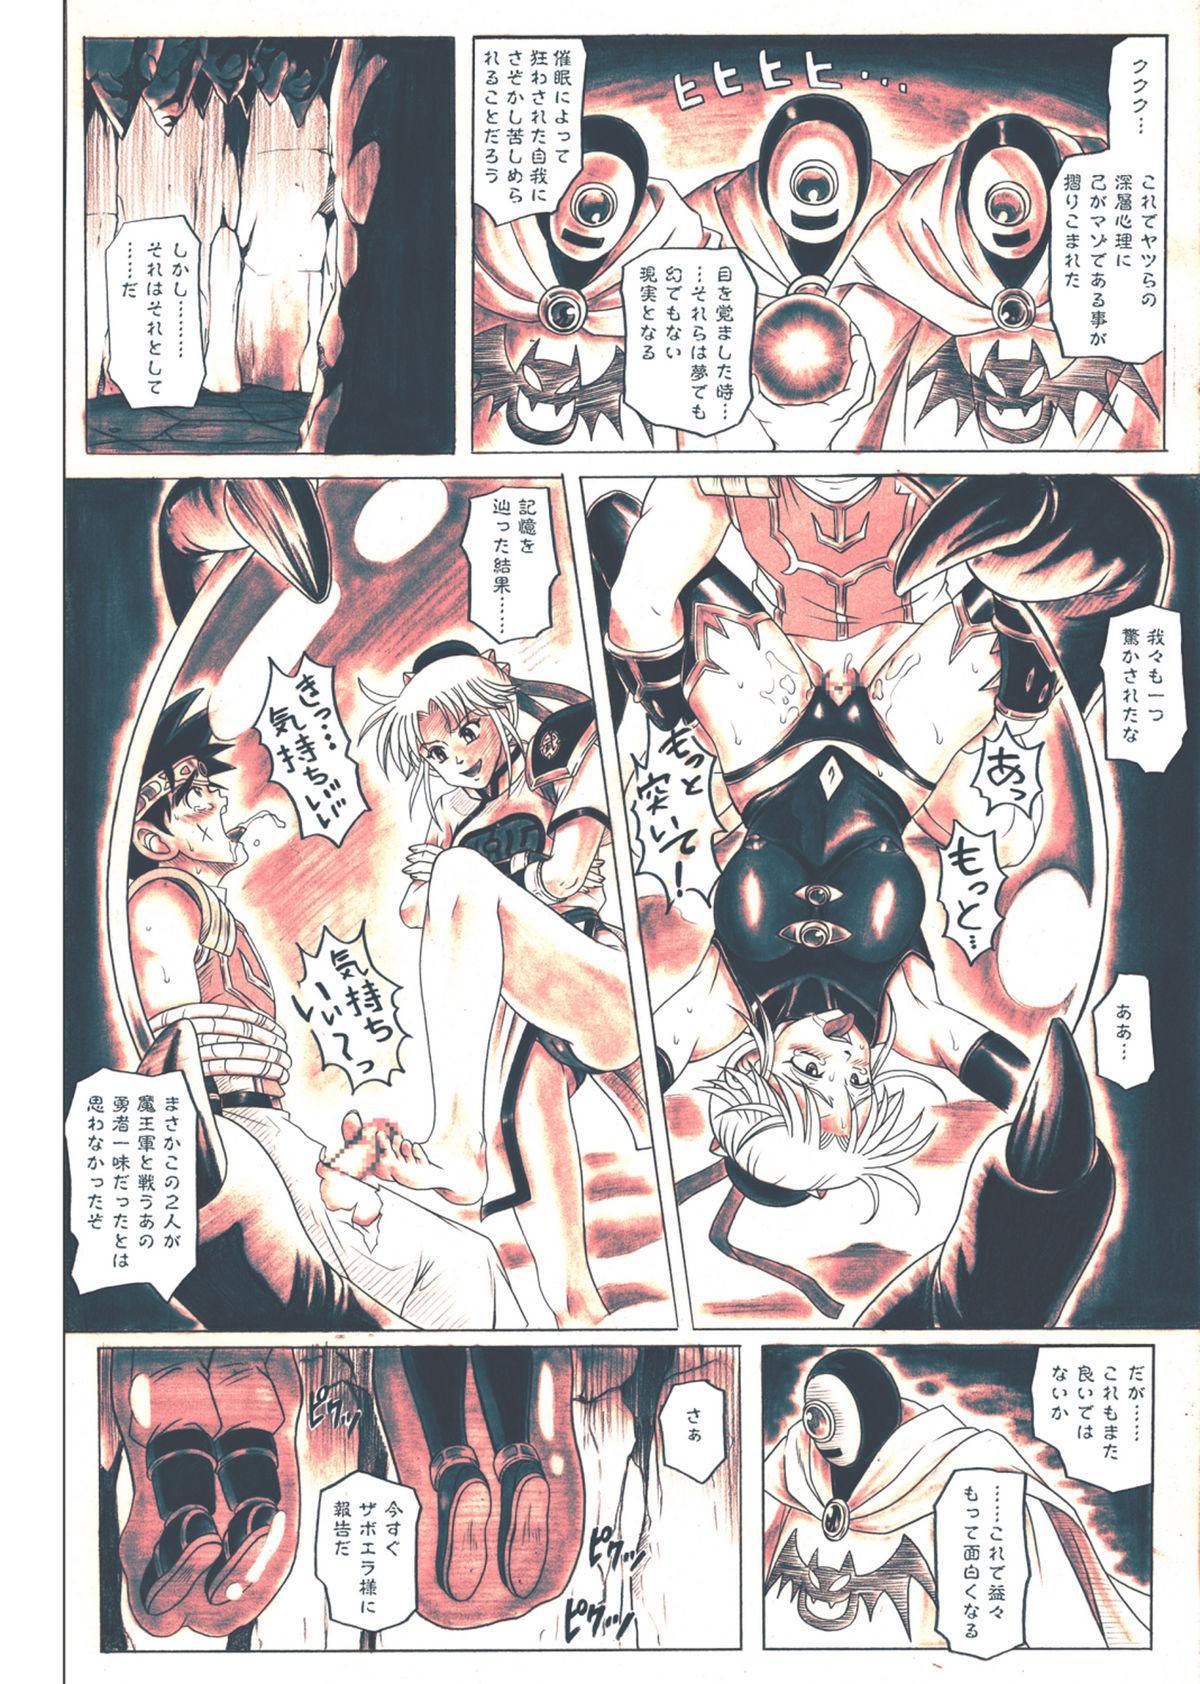 [Cyclone (Reizei, Izumi)] STAR TAC IDO ~Youkuso Haja no Doukutsu he~ Chuuhen Download edition (Dragon Warrior: Dai's Great Adventure) [Digital] 137